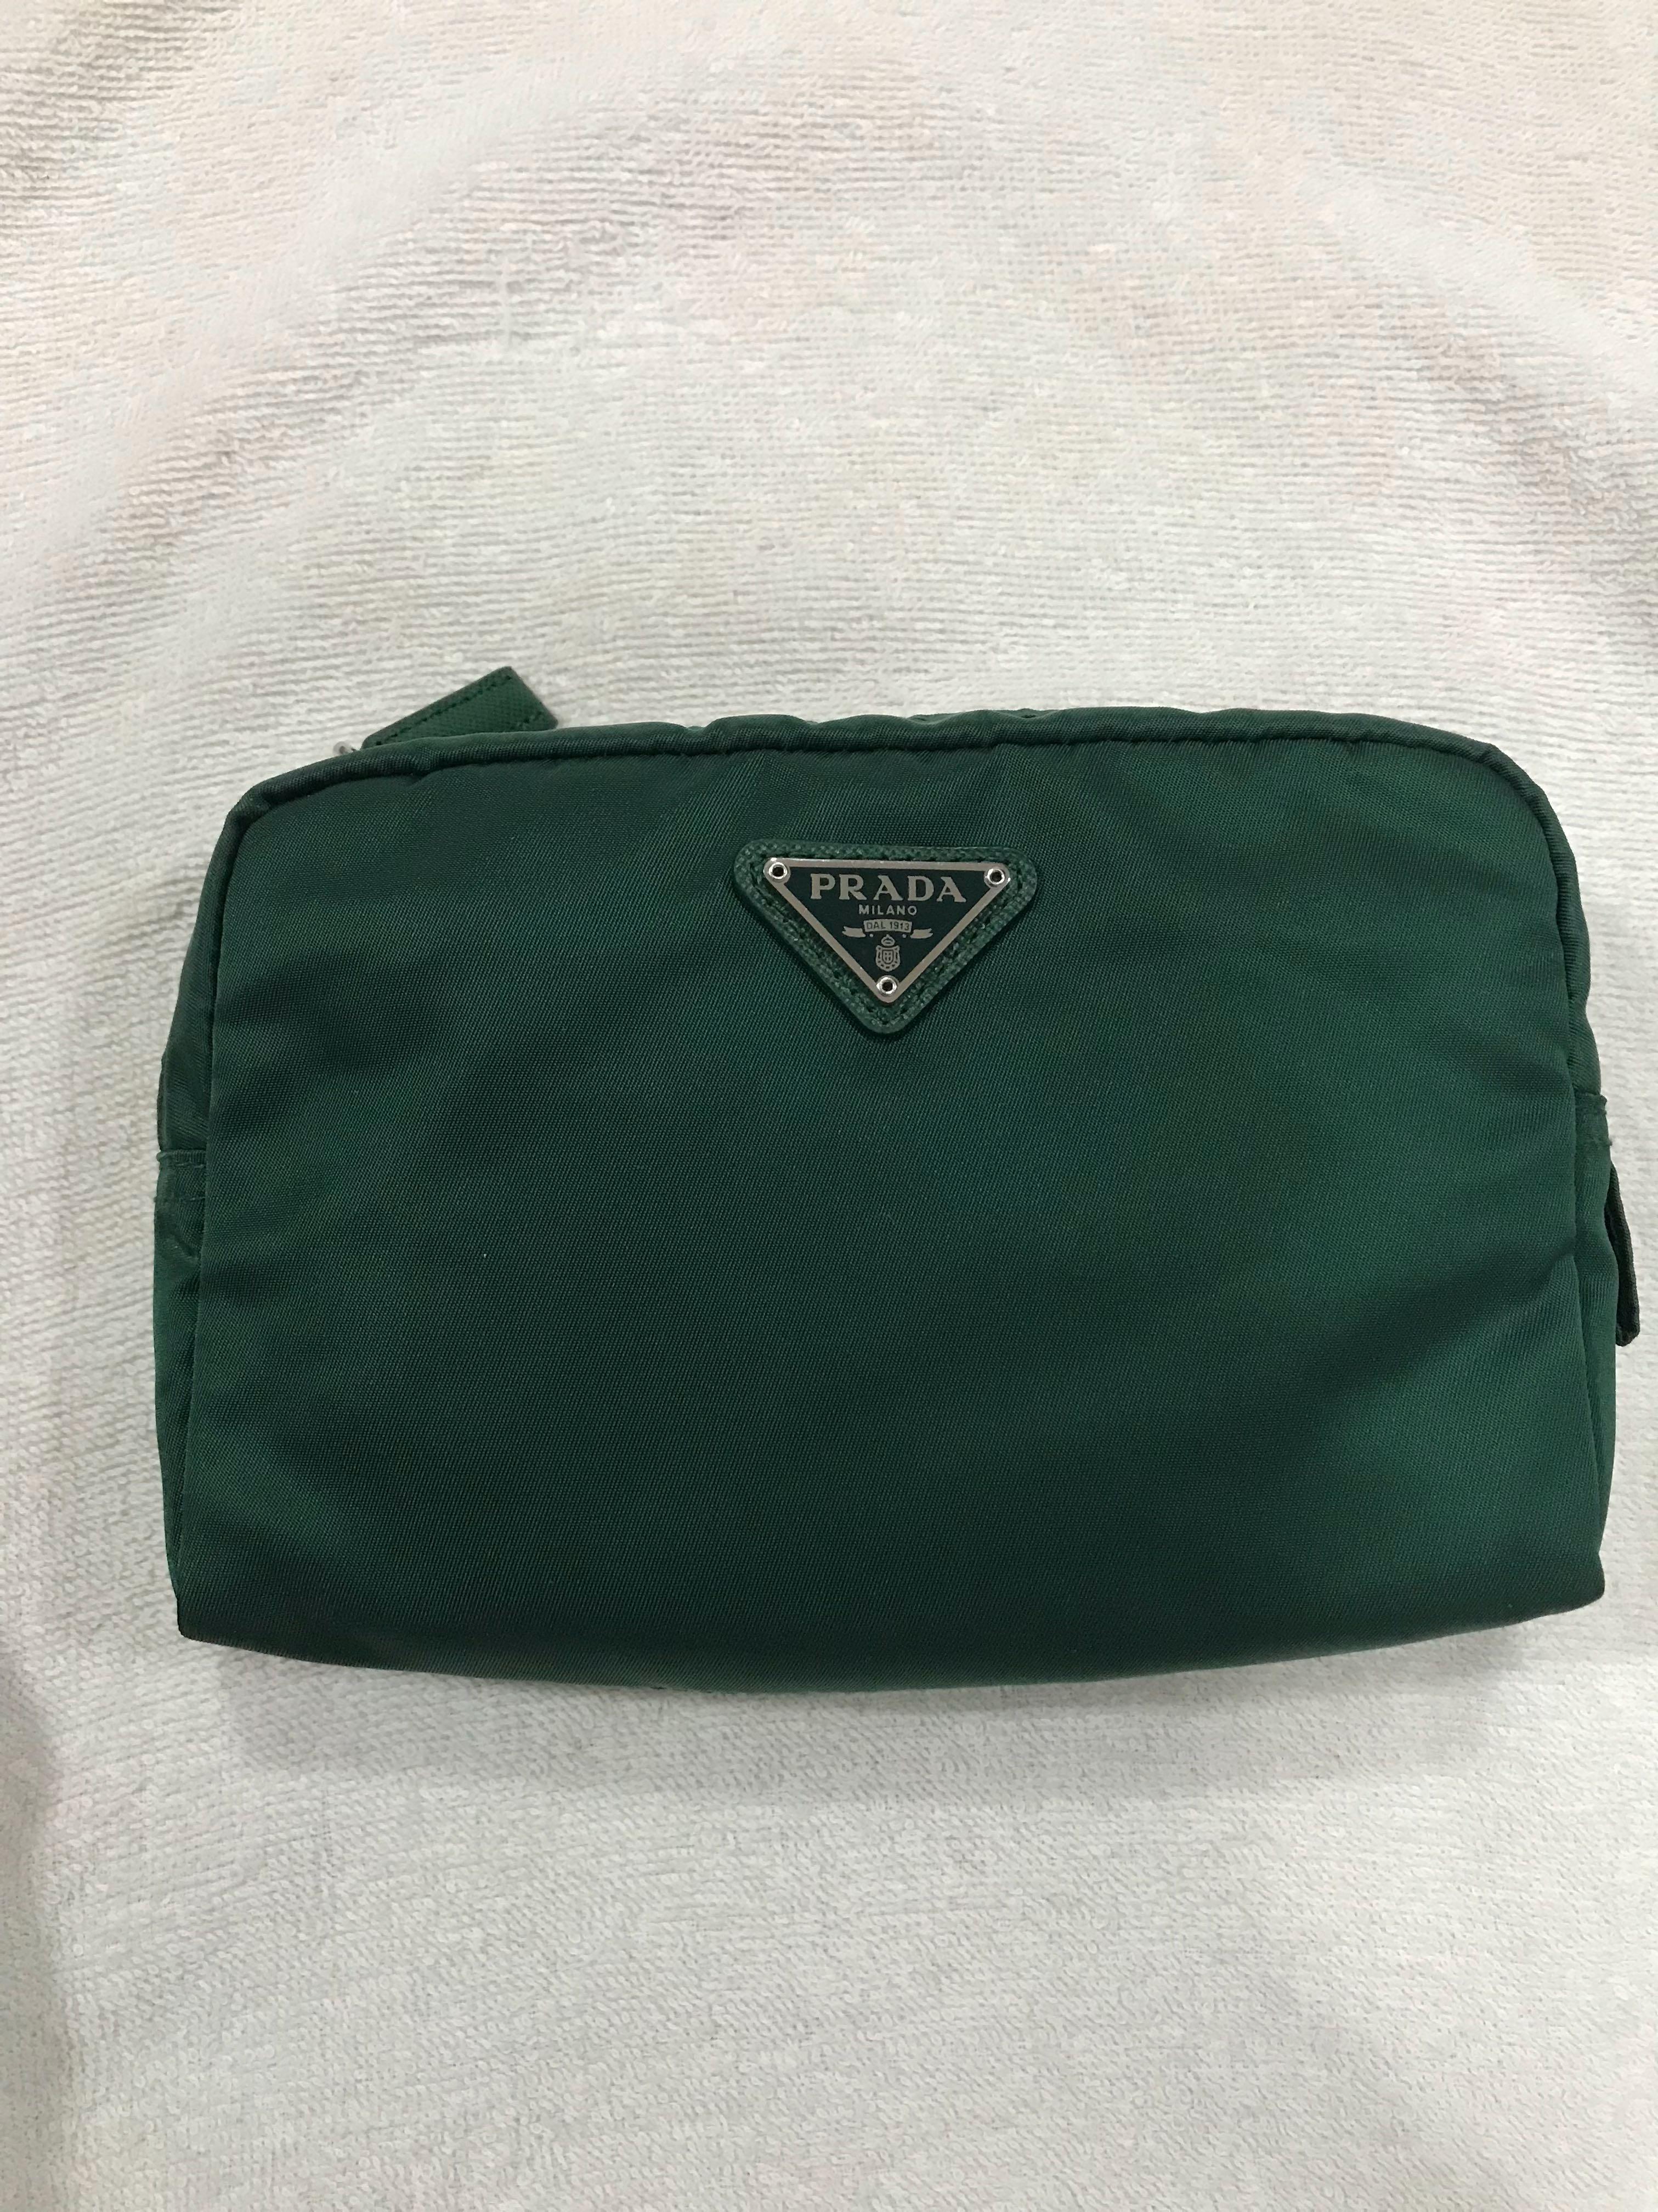 85f7aa981d92 ... australia prada nylon cosmetic pouch womens fashion bags wallets on  carousell 3025d 3690b ...